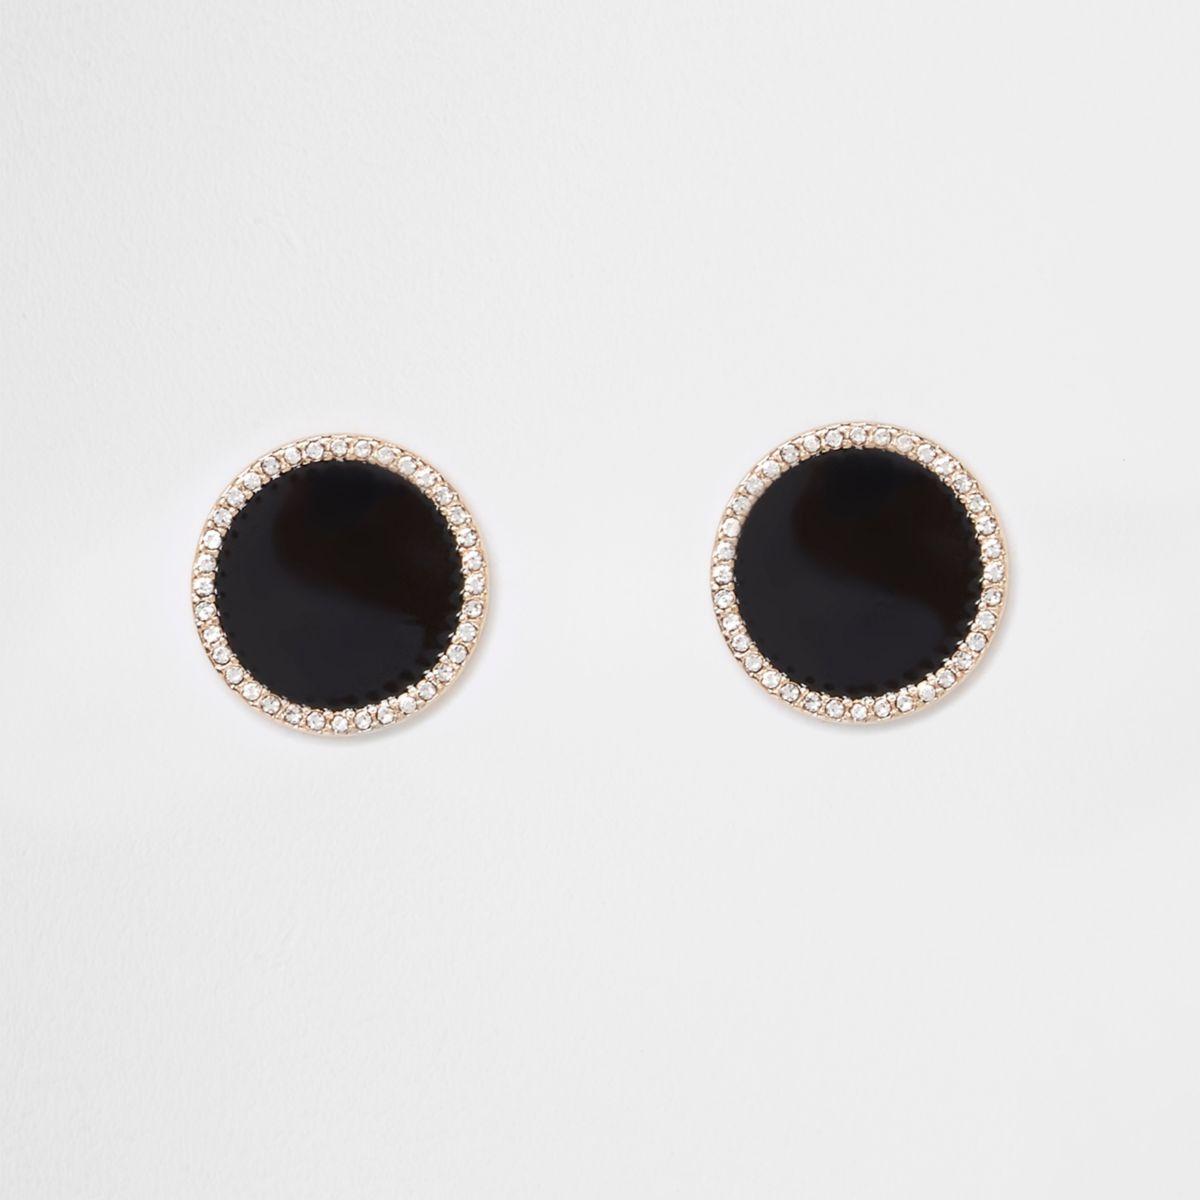 Black large round rhinestone stud earrings